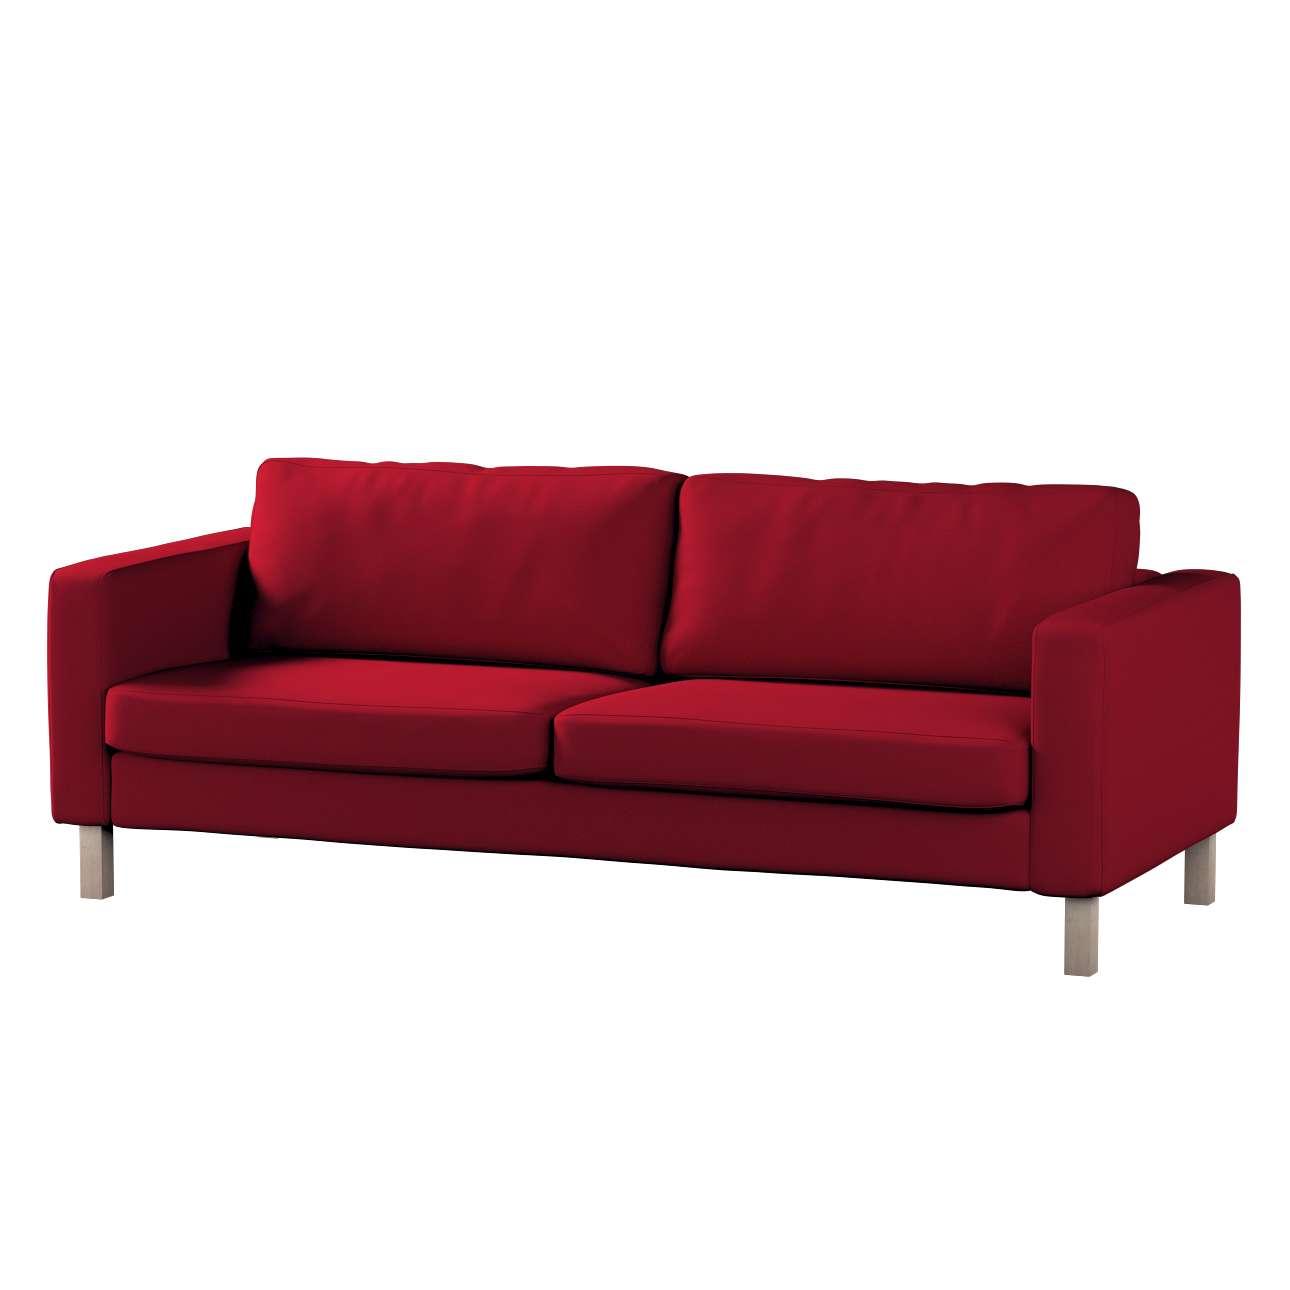 KARSLTAD trvivietės sofos užvalkalas Karlstad 3-vietės sofos užvalkalas (neišlankstomai sofai) kolekcijoje Etna , audinys: 705-60